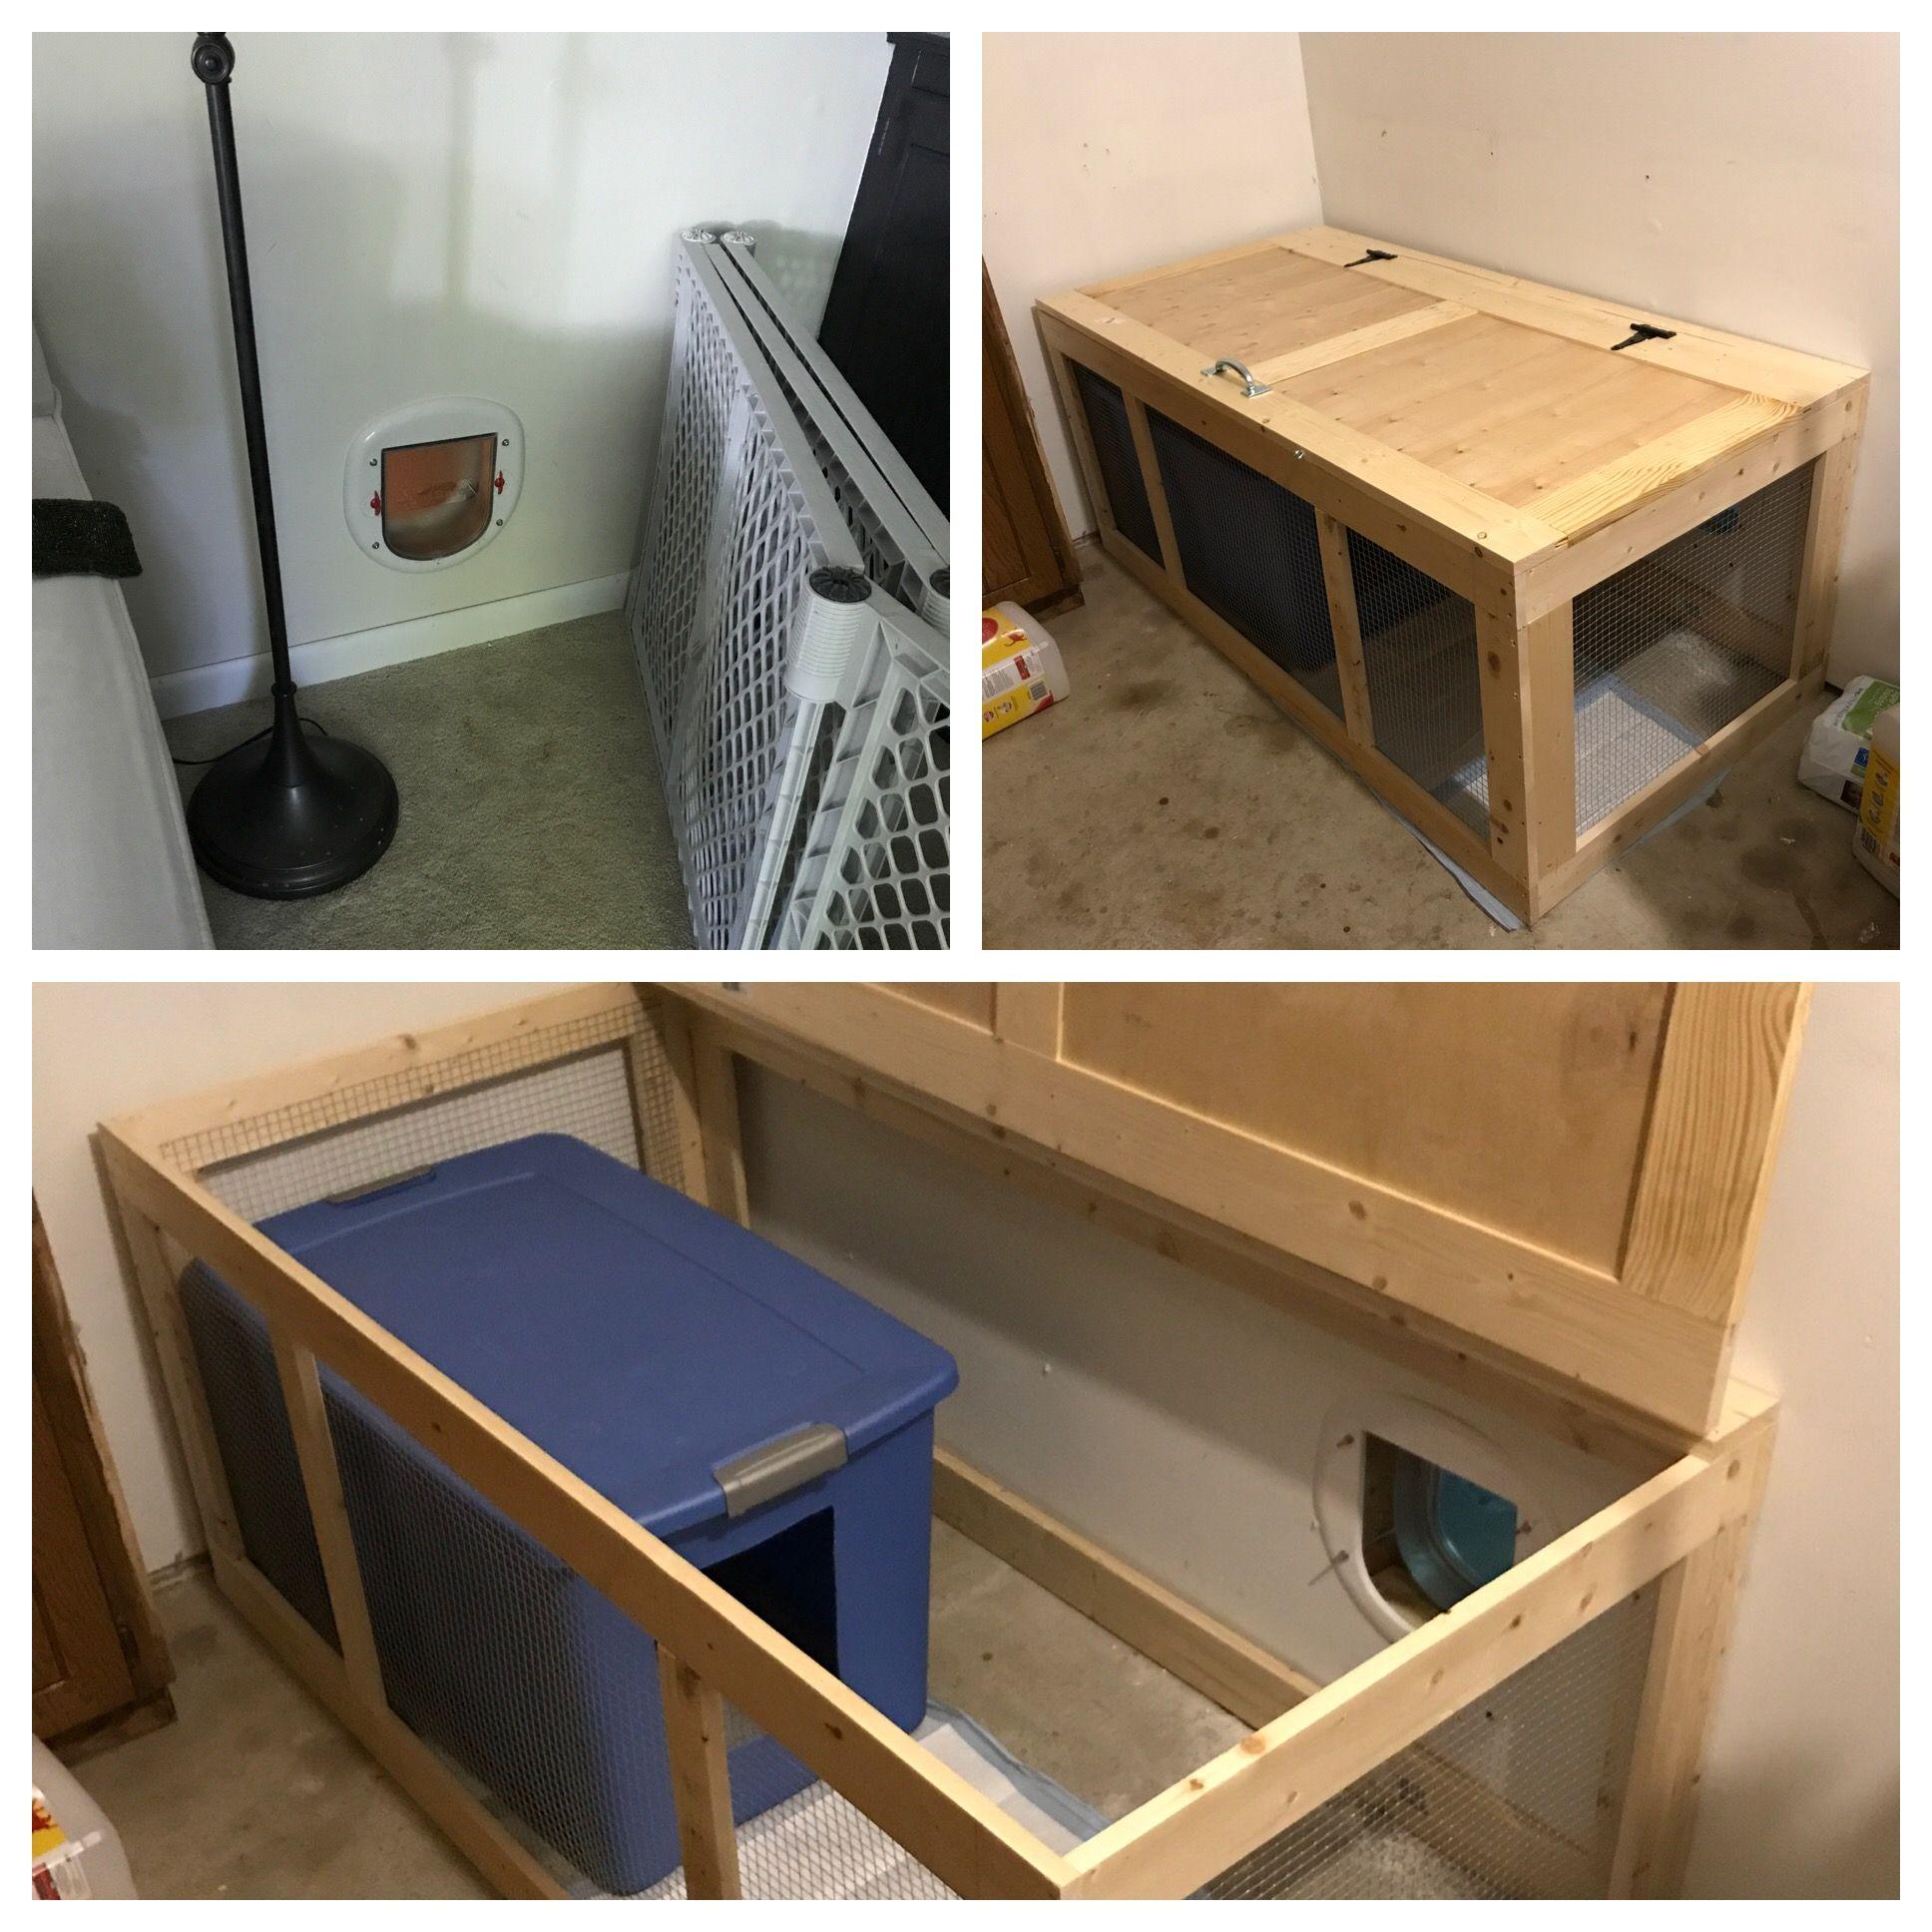 Litter Box Enclosure Door From Living Room To Garage Litter Box